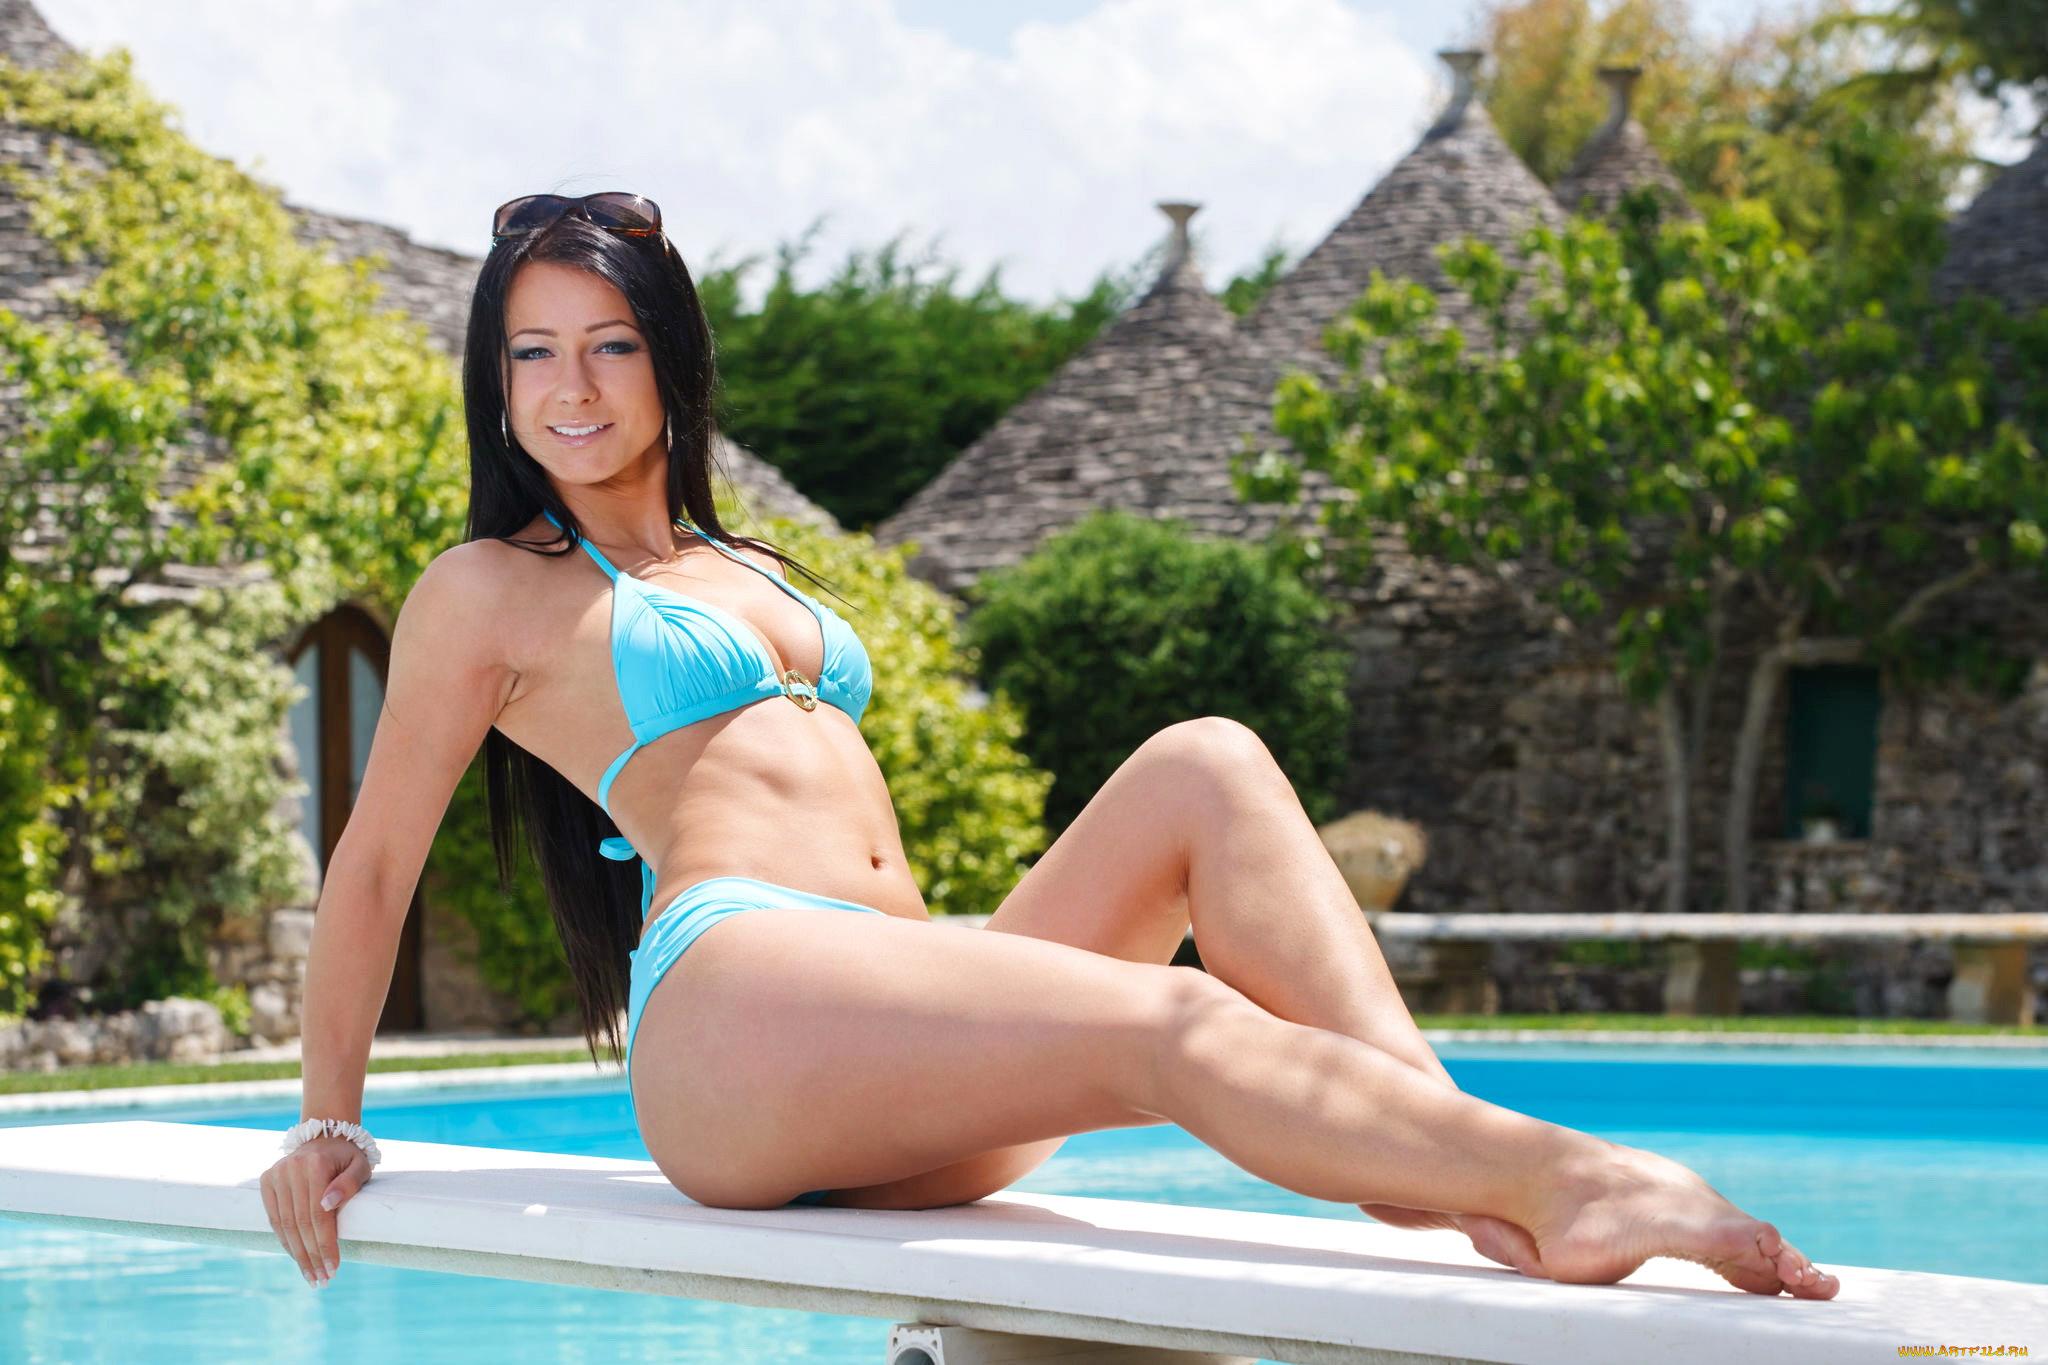 doenloadable-bikini-feet-picture-download-nude-men